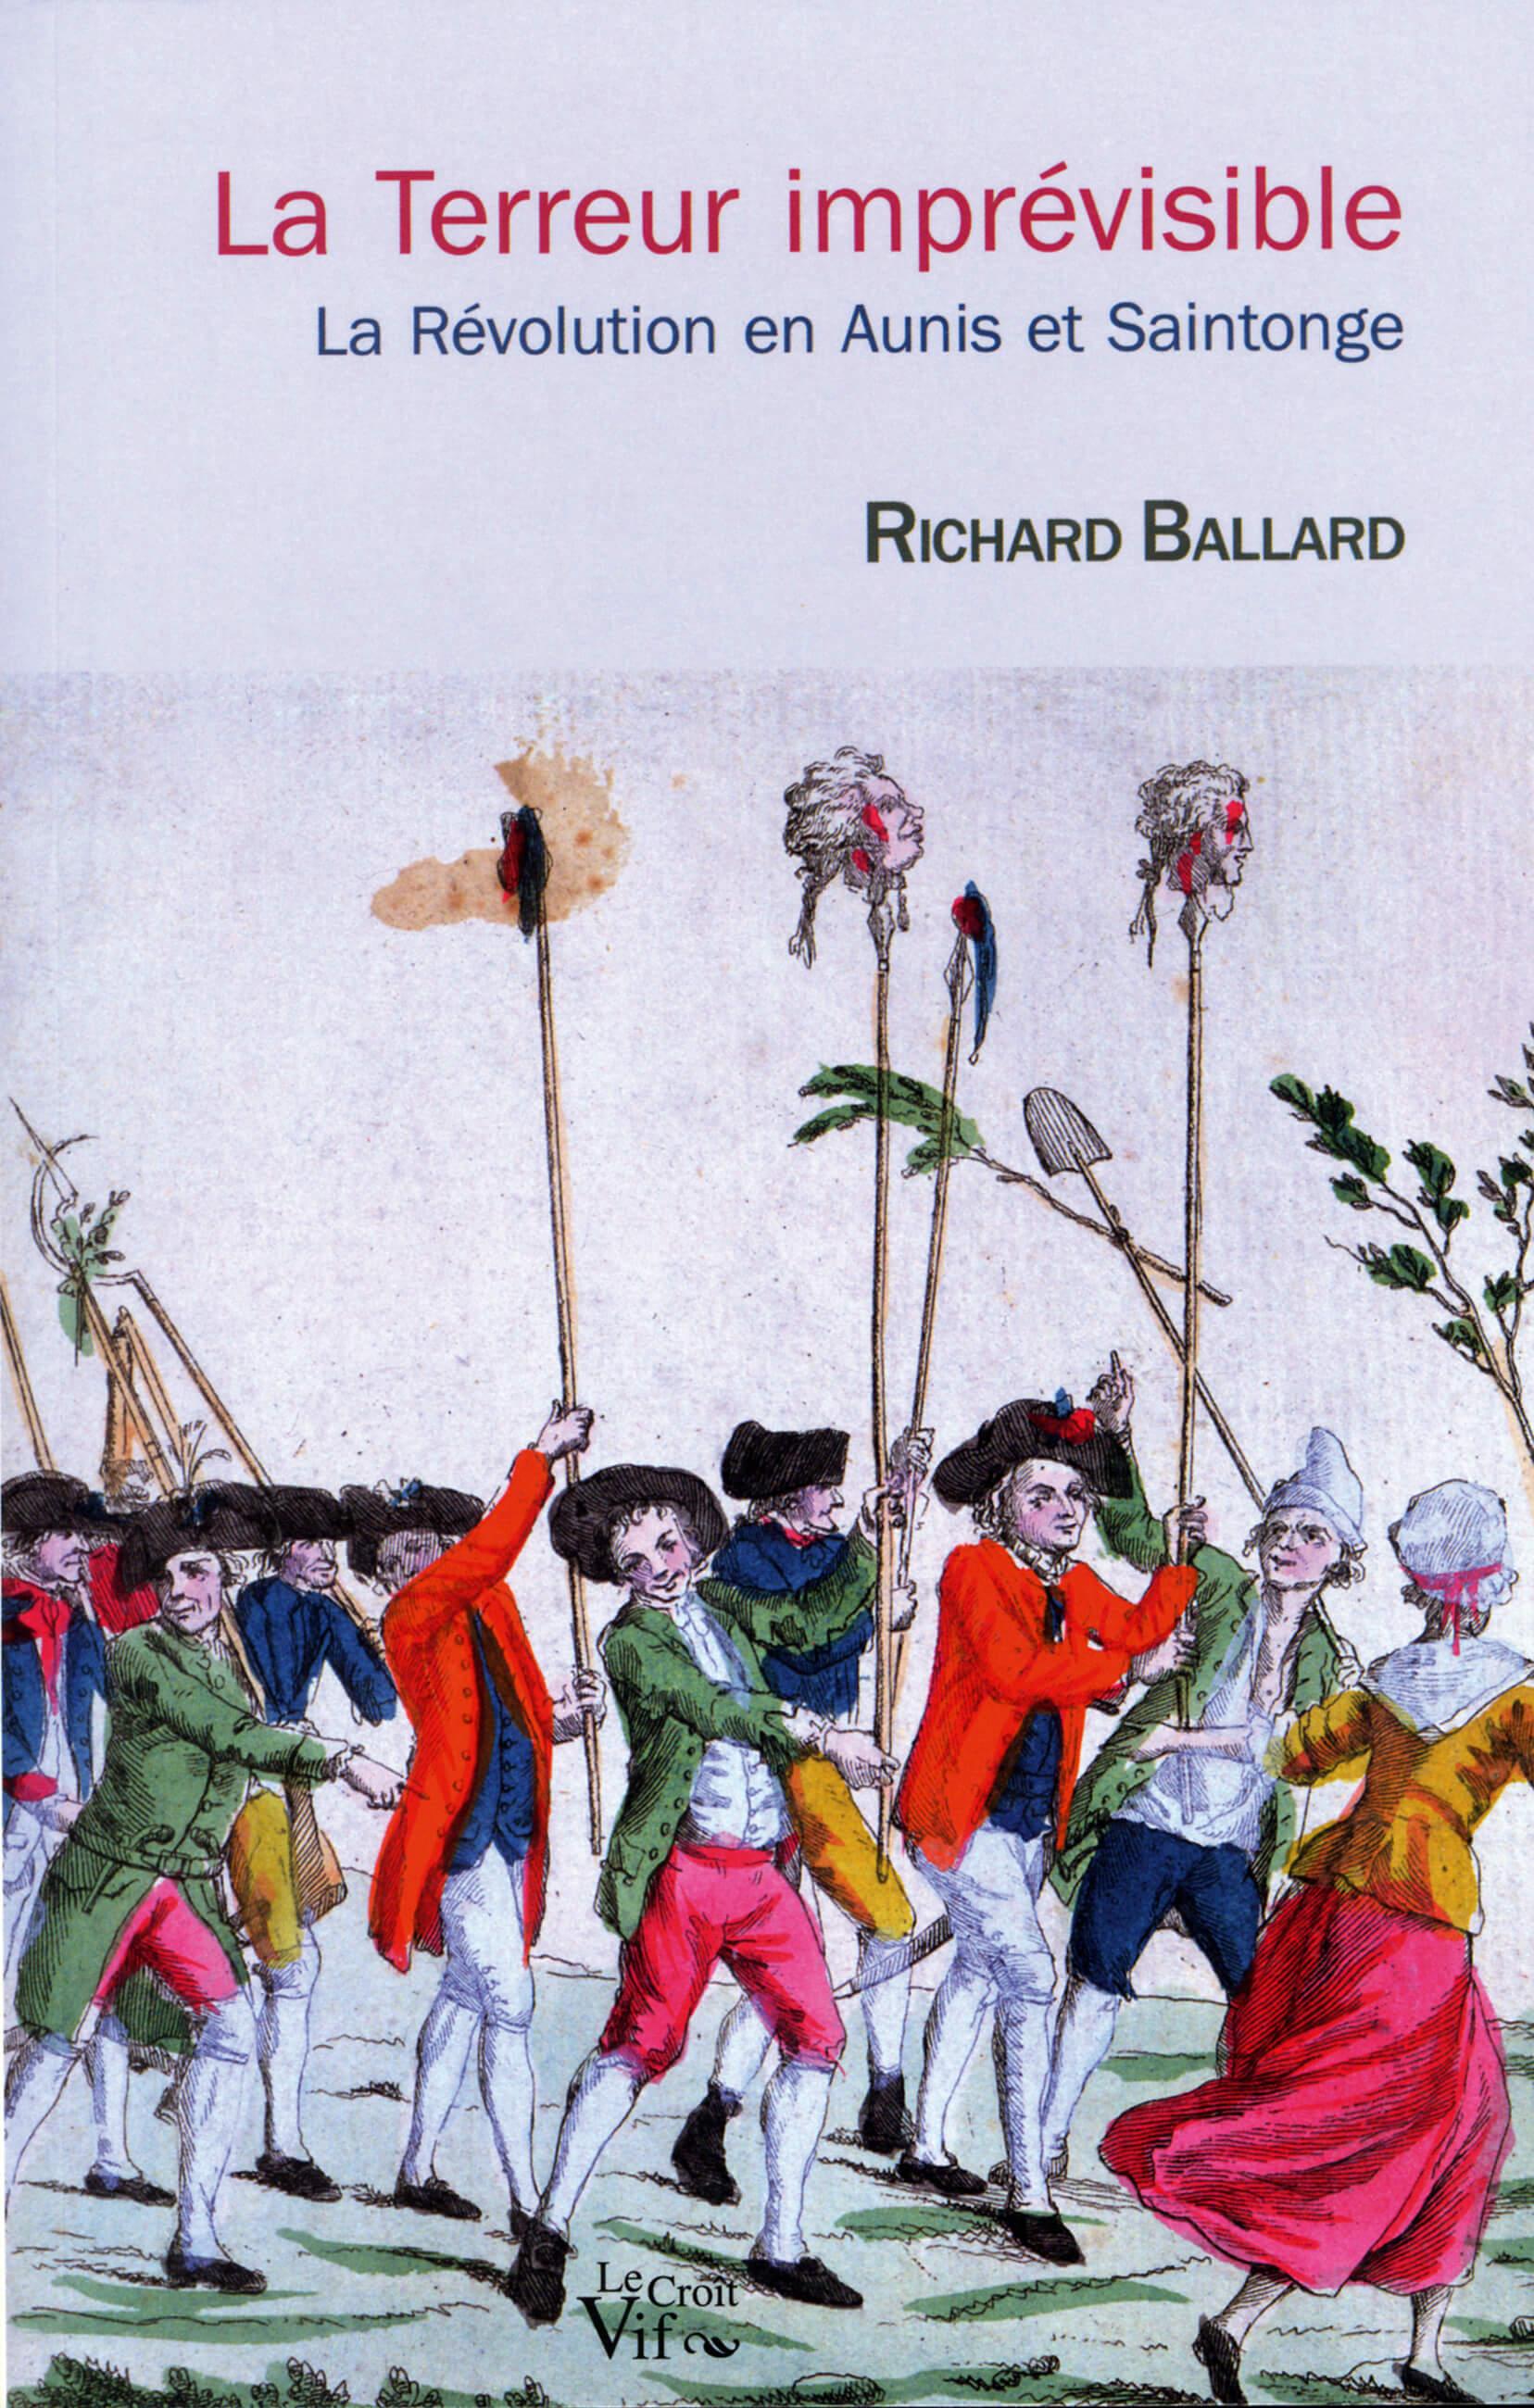 Richard BALLARD - La terreur imprévisible - PDM 2013